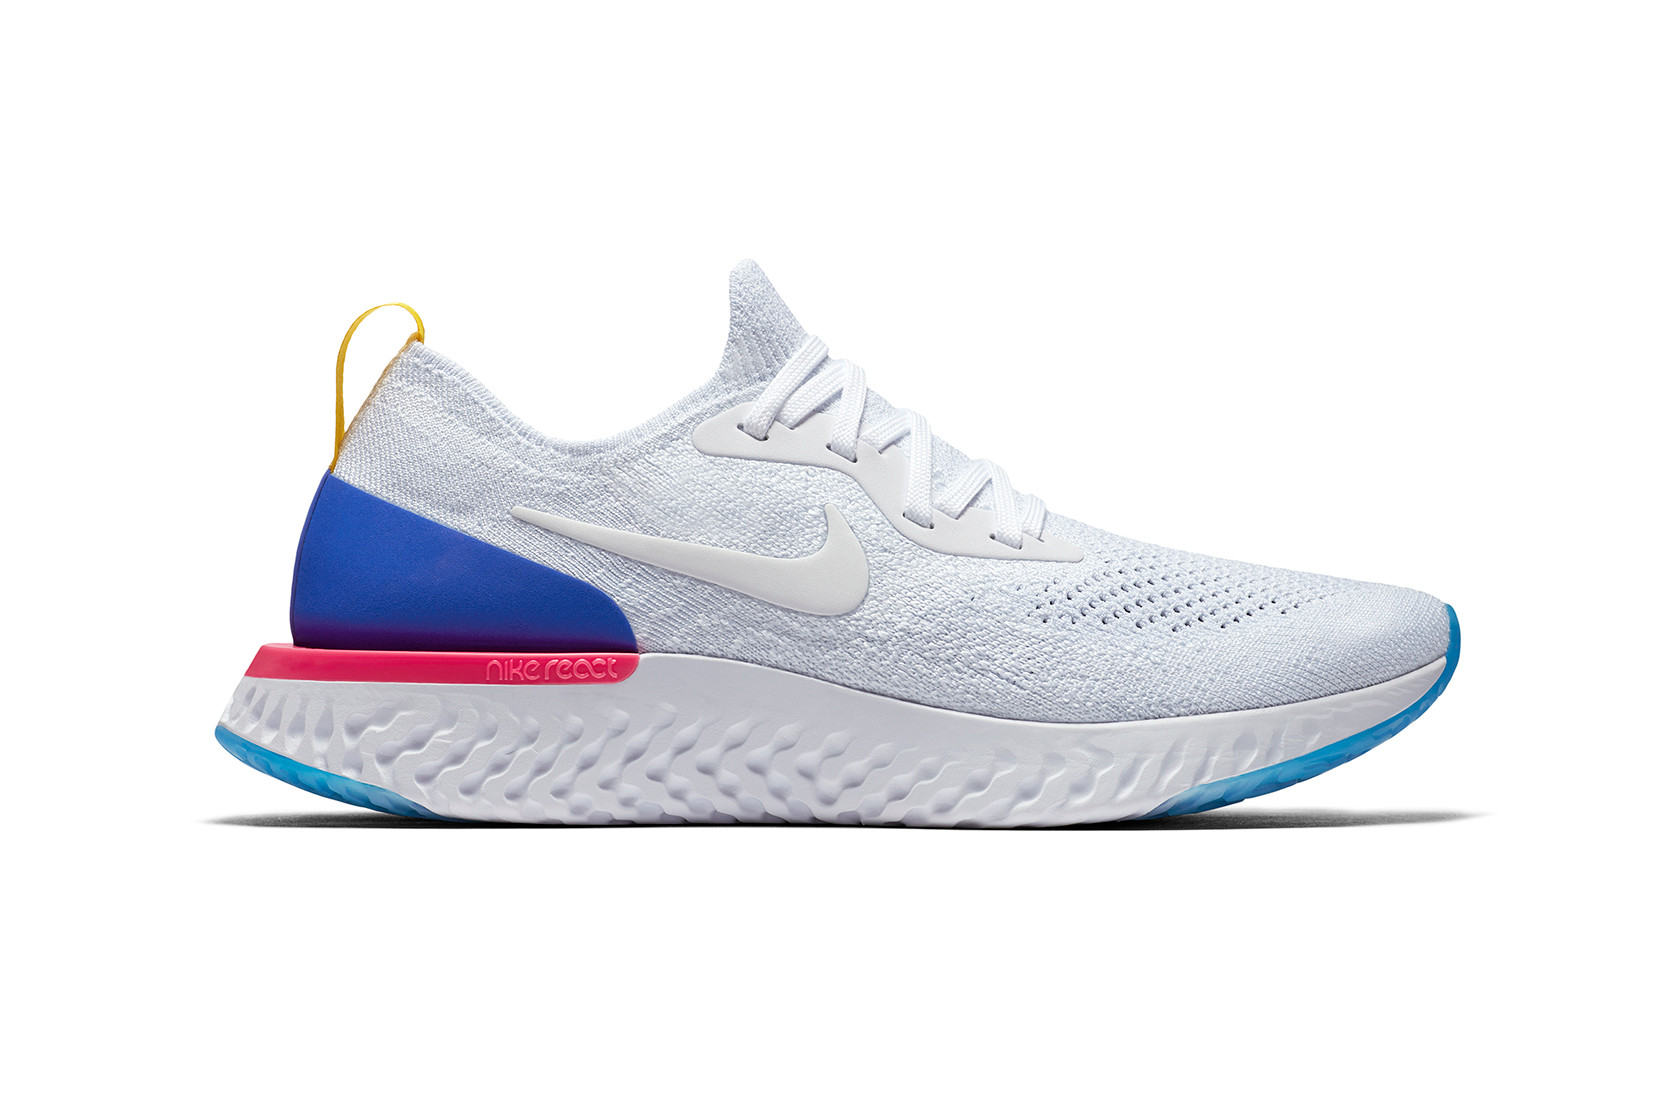 Nike Reveals Epic React Flyknit Running